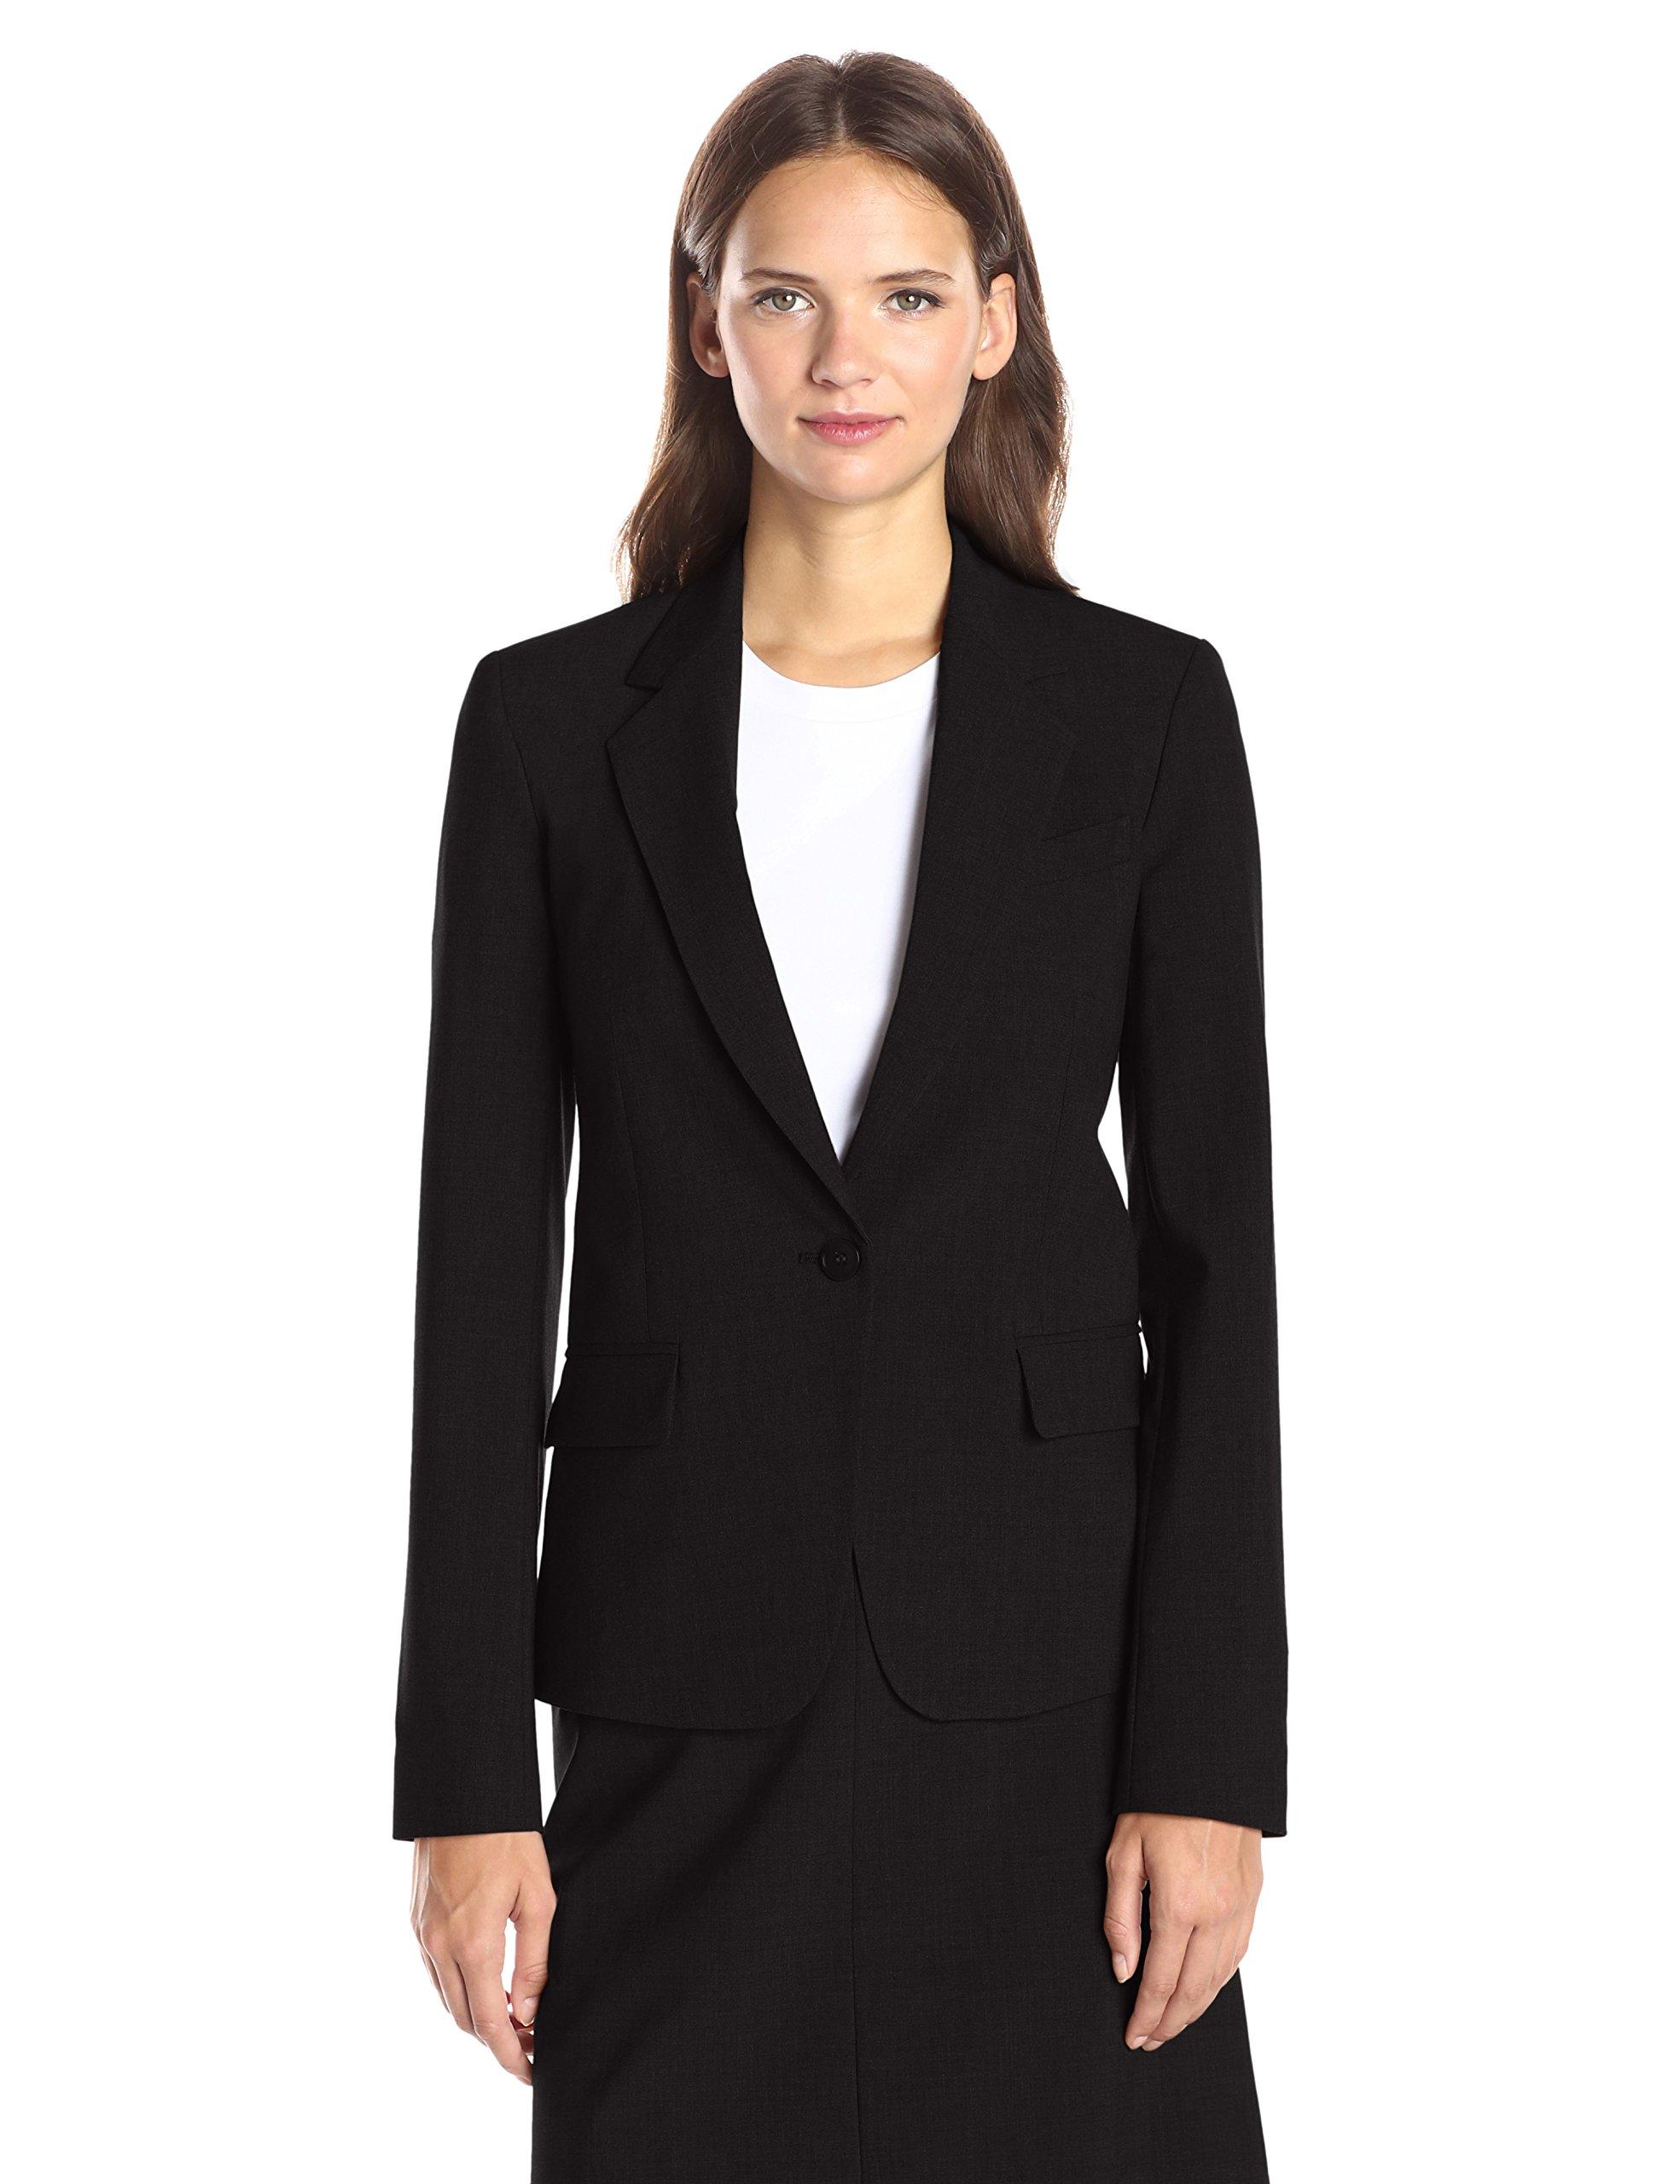 Theory Women's Gabe N Edition 4 Jacket, Black, 4